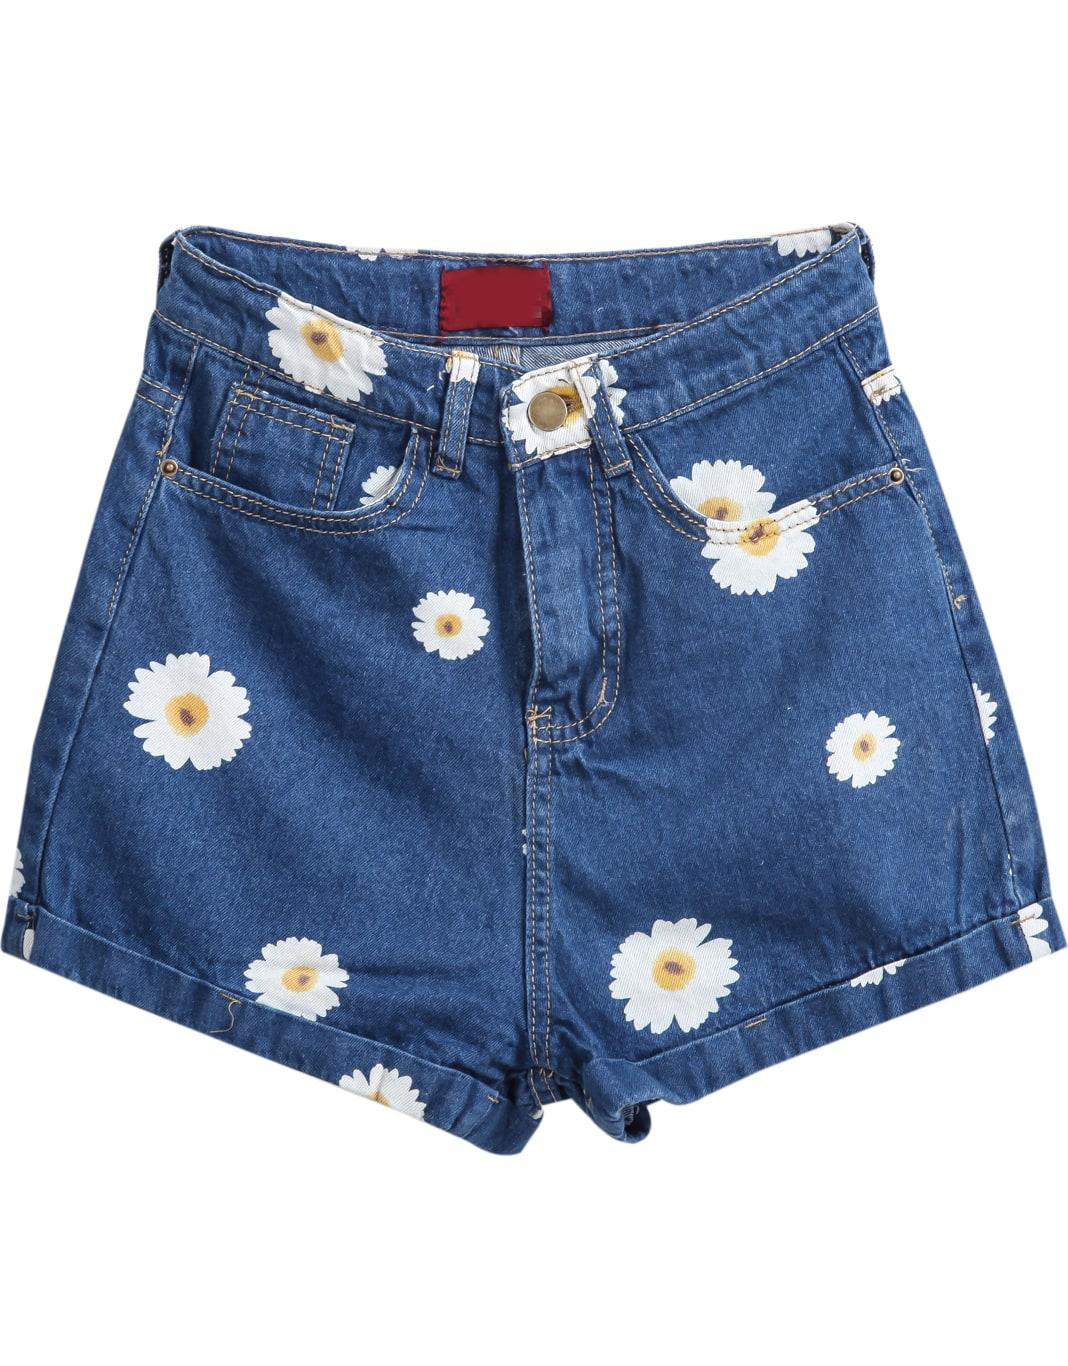 Pockets Daisy Print Denim ShortsFor Women-romwe